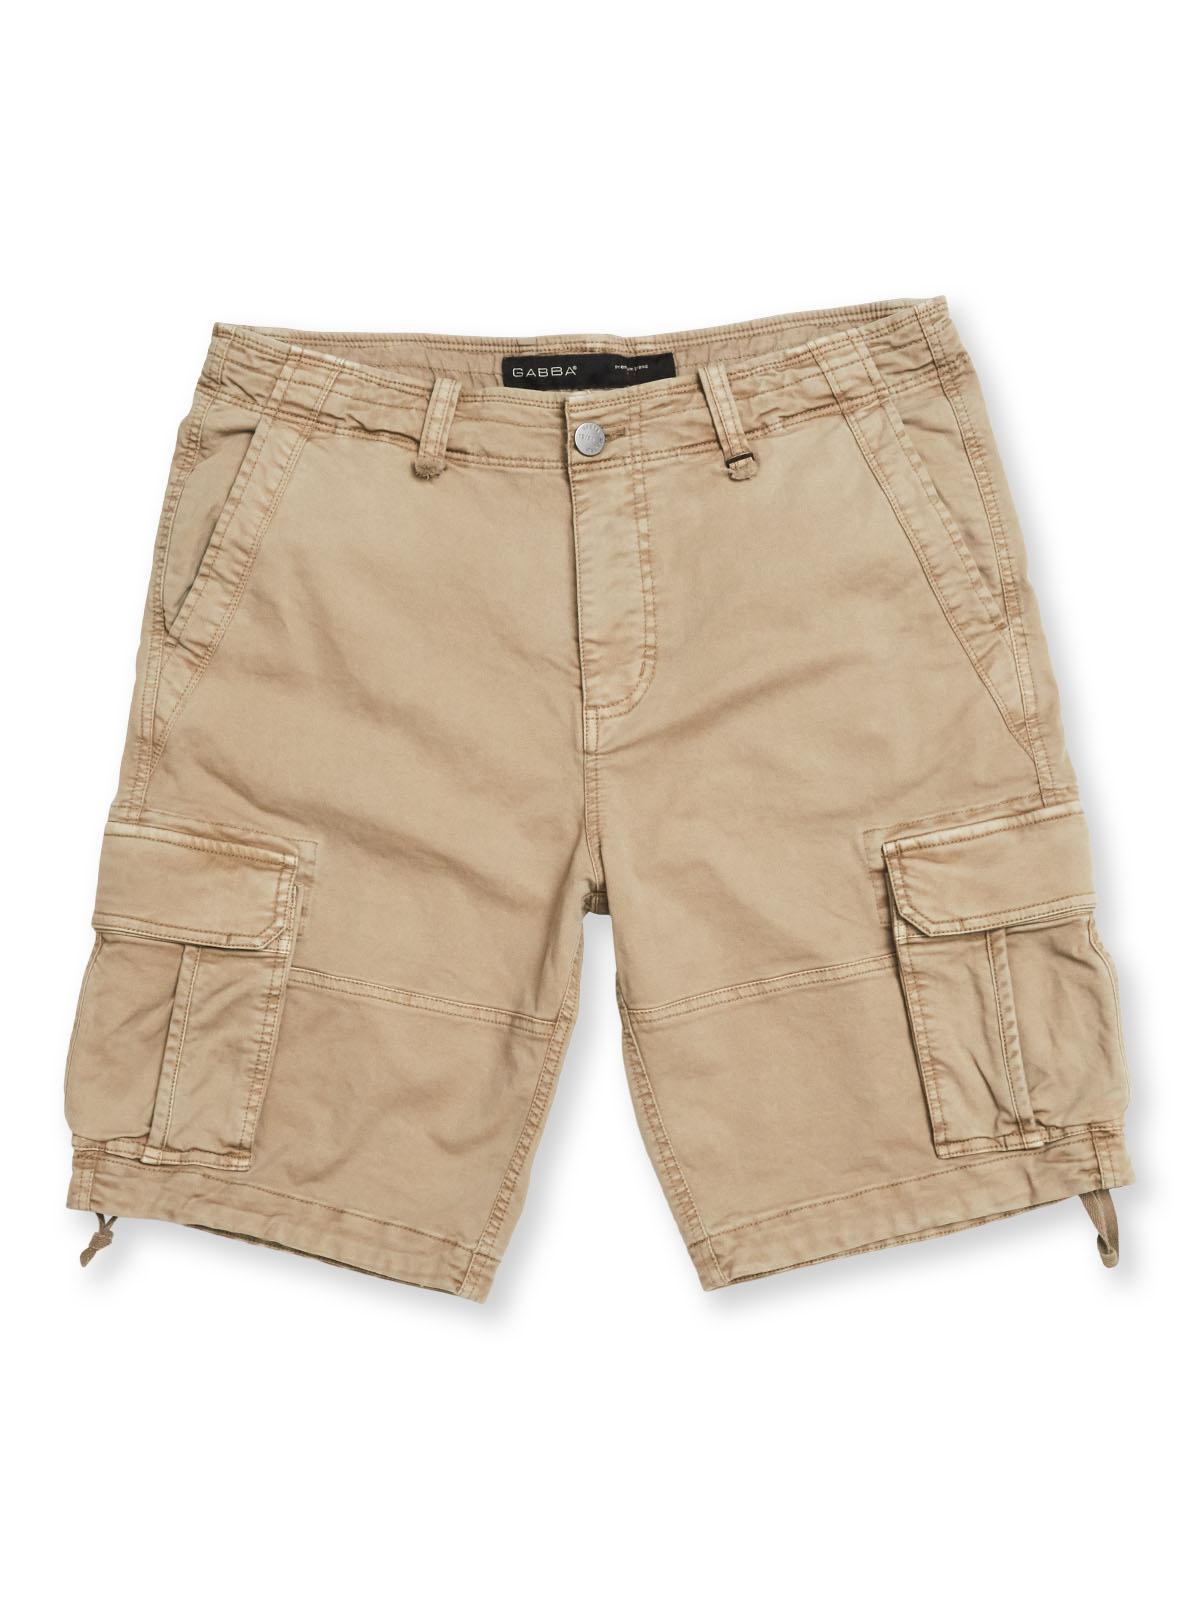 Rufo Cargo Shorts